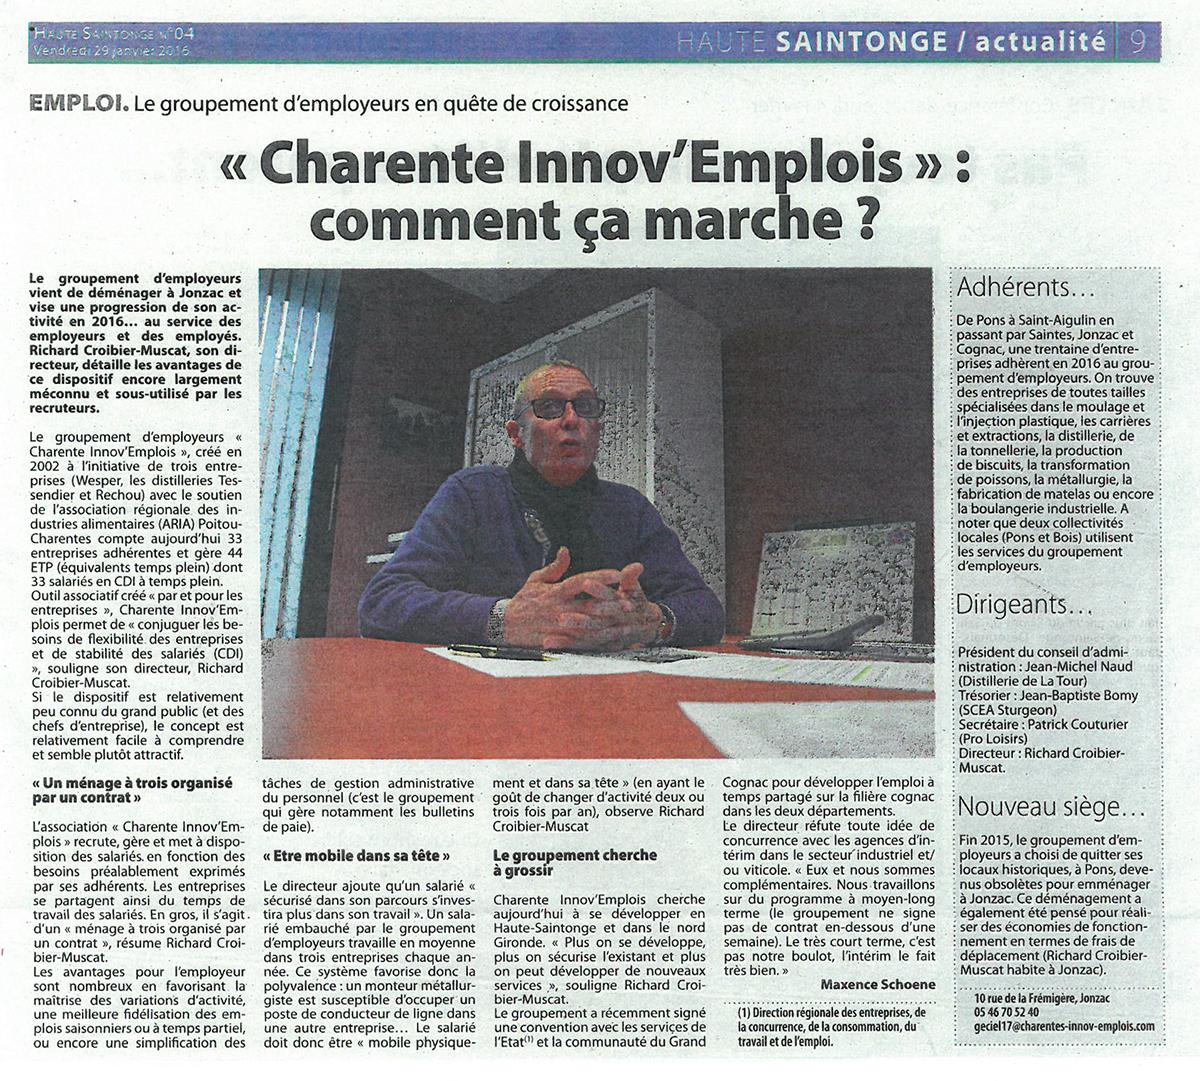 Charentes-Innov-Emplois-HAUTE-SAINTONGE-ARTICLE-GROUPEMENT